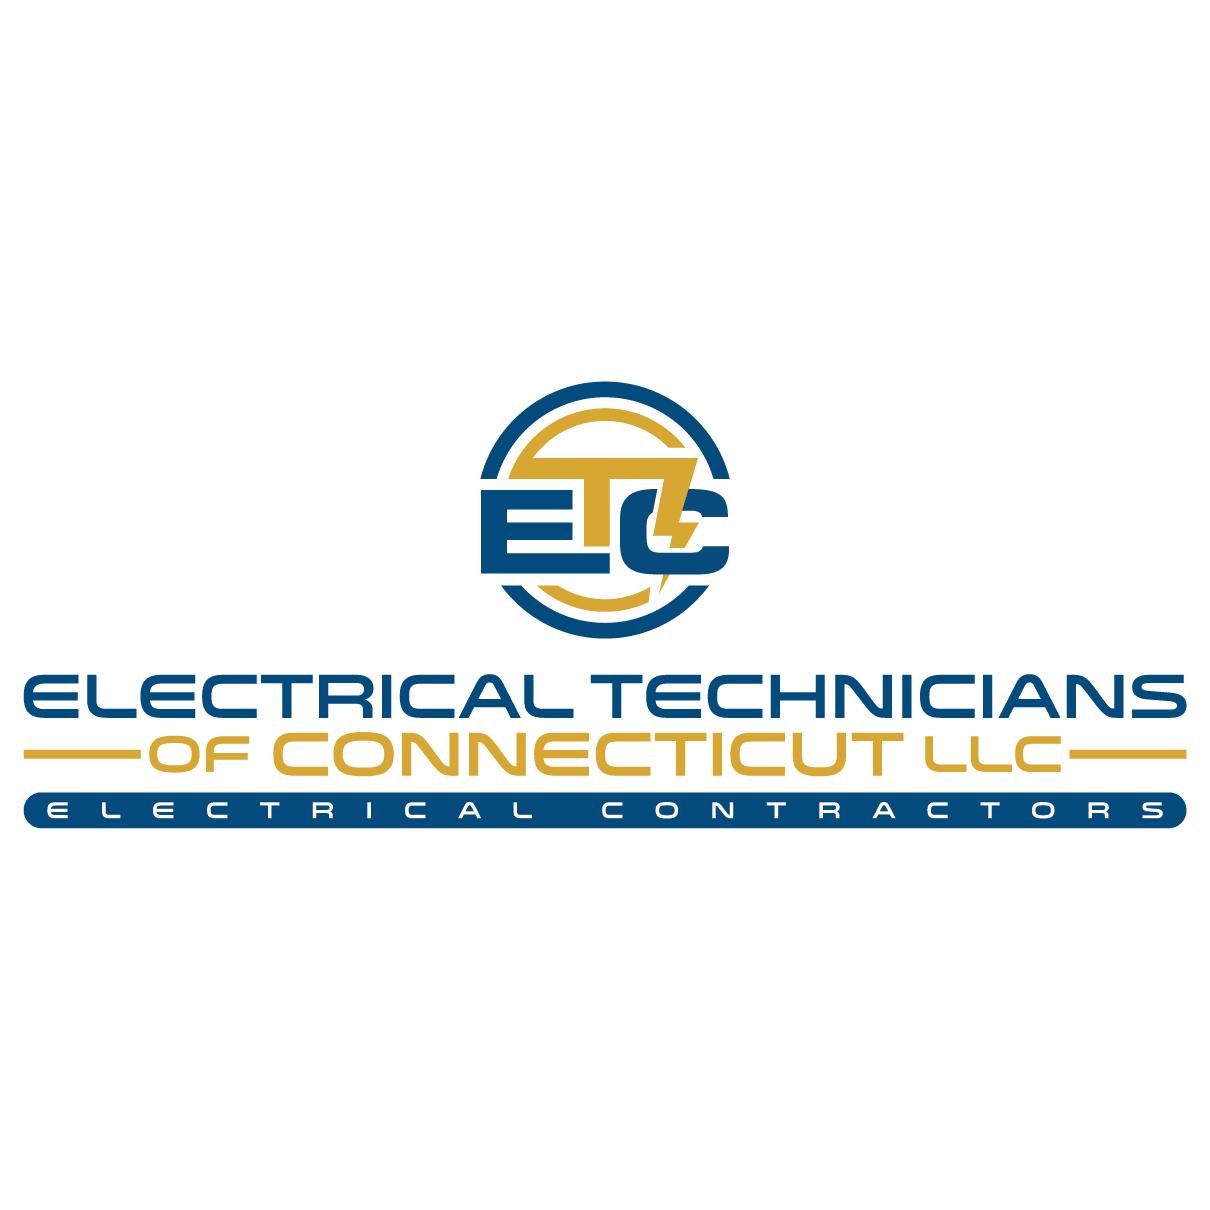 Electrical Technicians of Connecticut LLC - Southbury, CT - Electricians